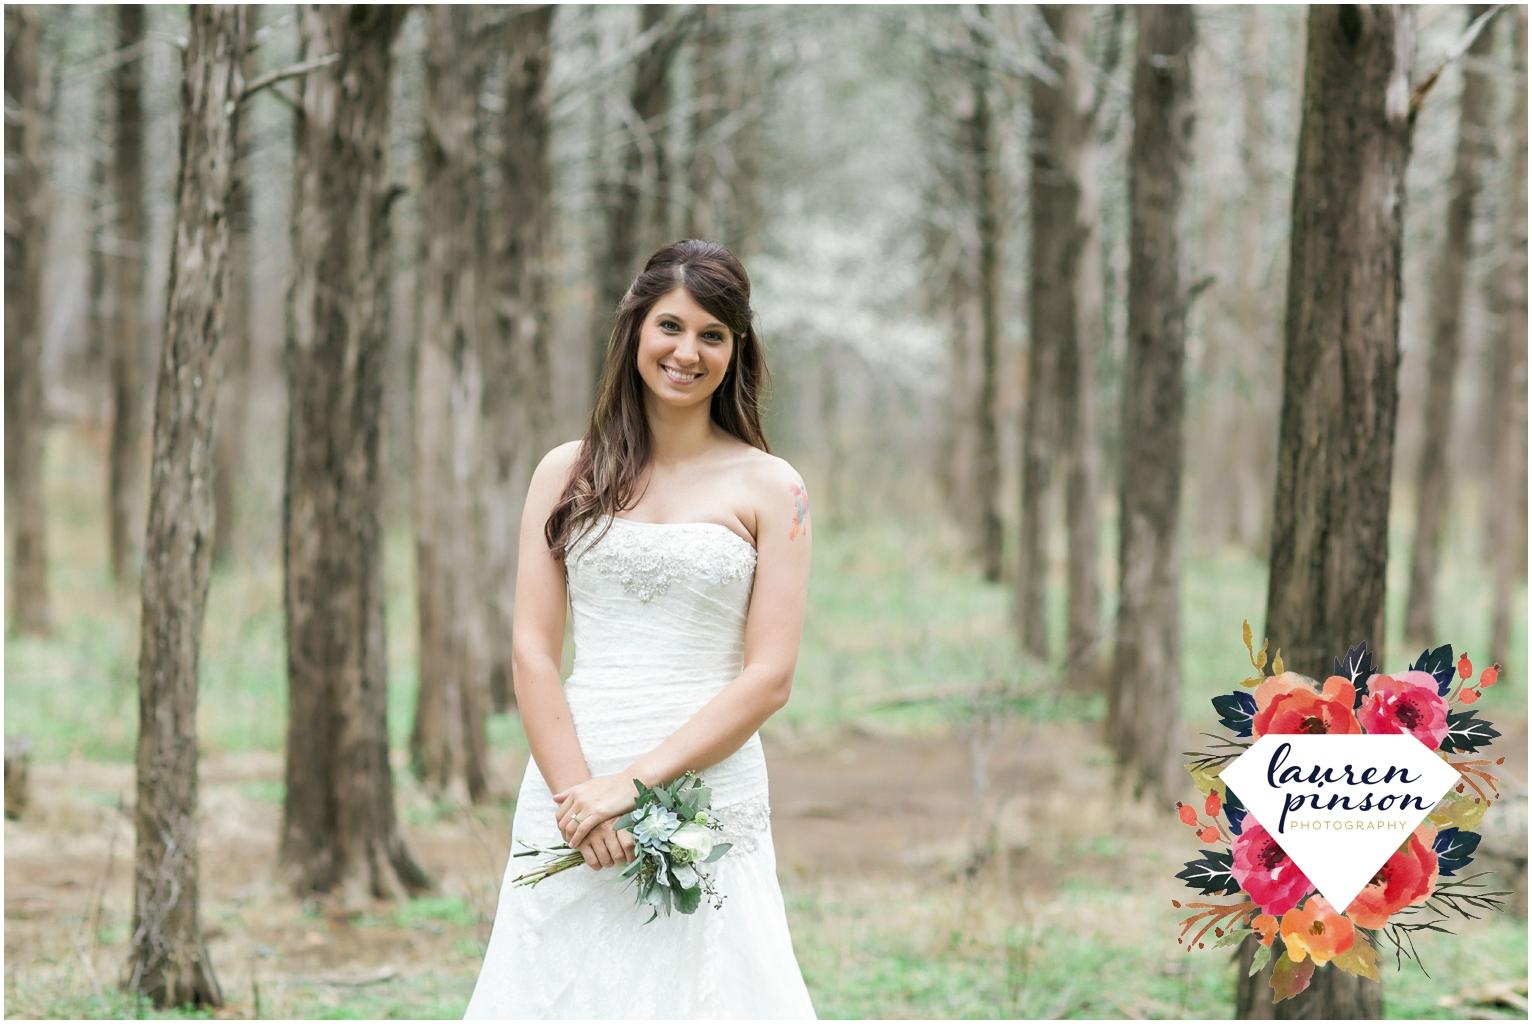 wichita-falls-wedding-photographer-oklahoma-wichita-mountains-bridal-session-bridals-photography_0690.jpg